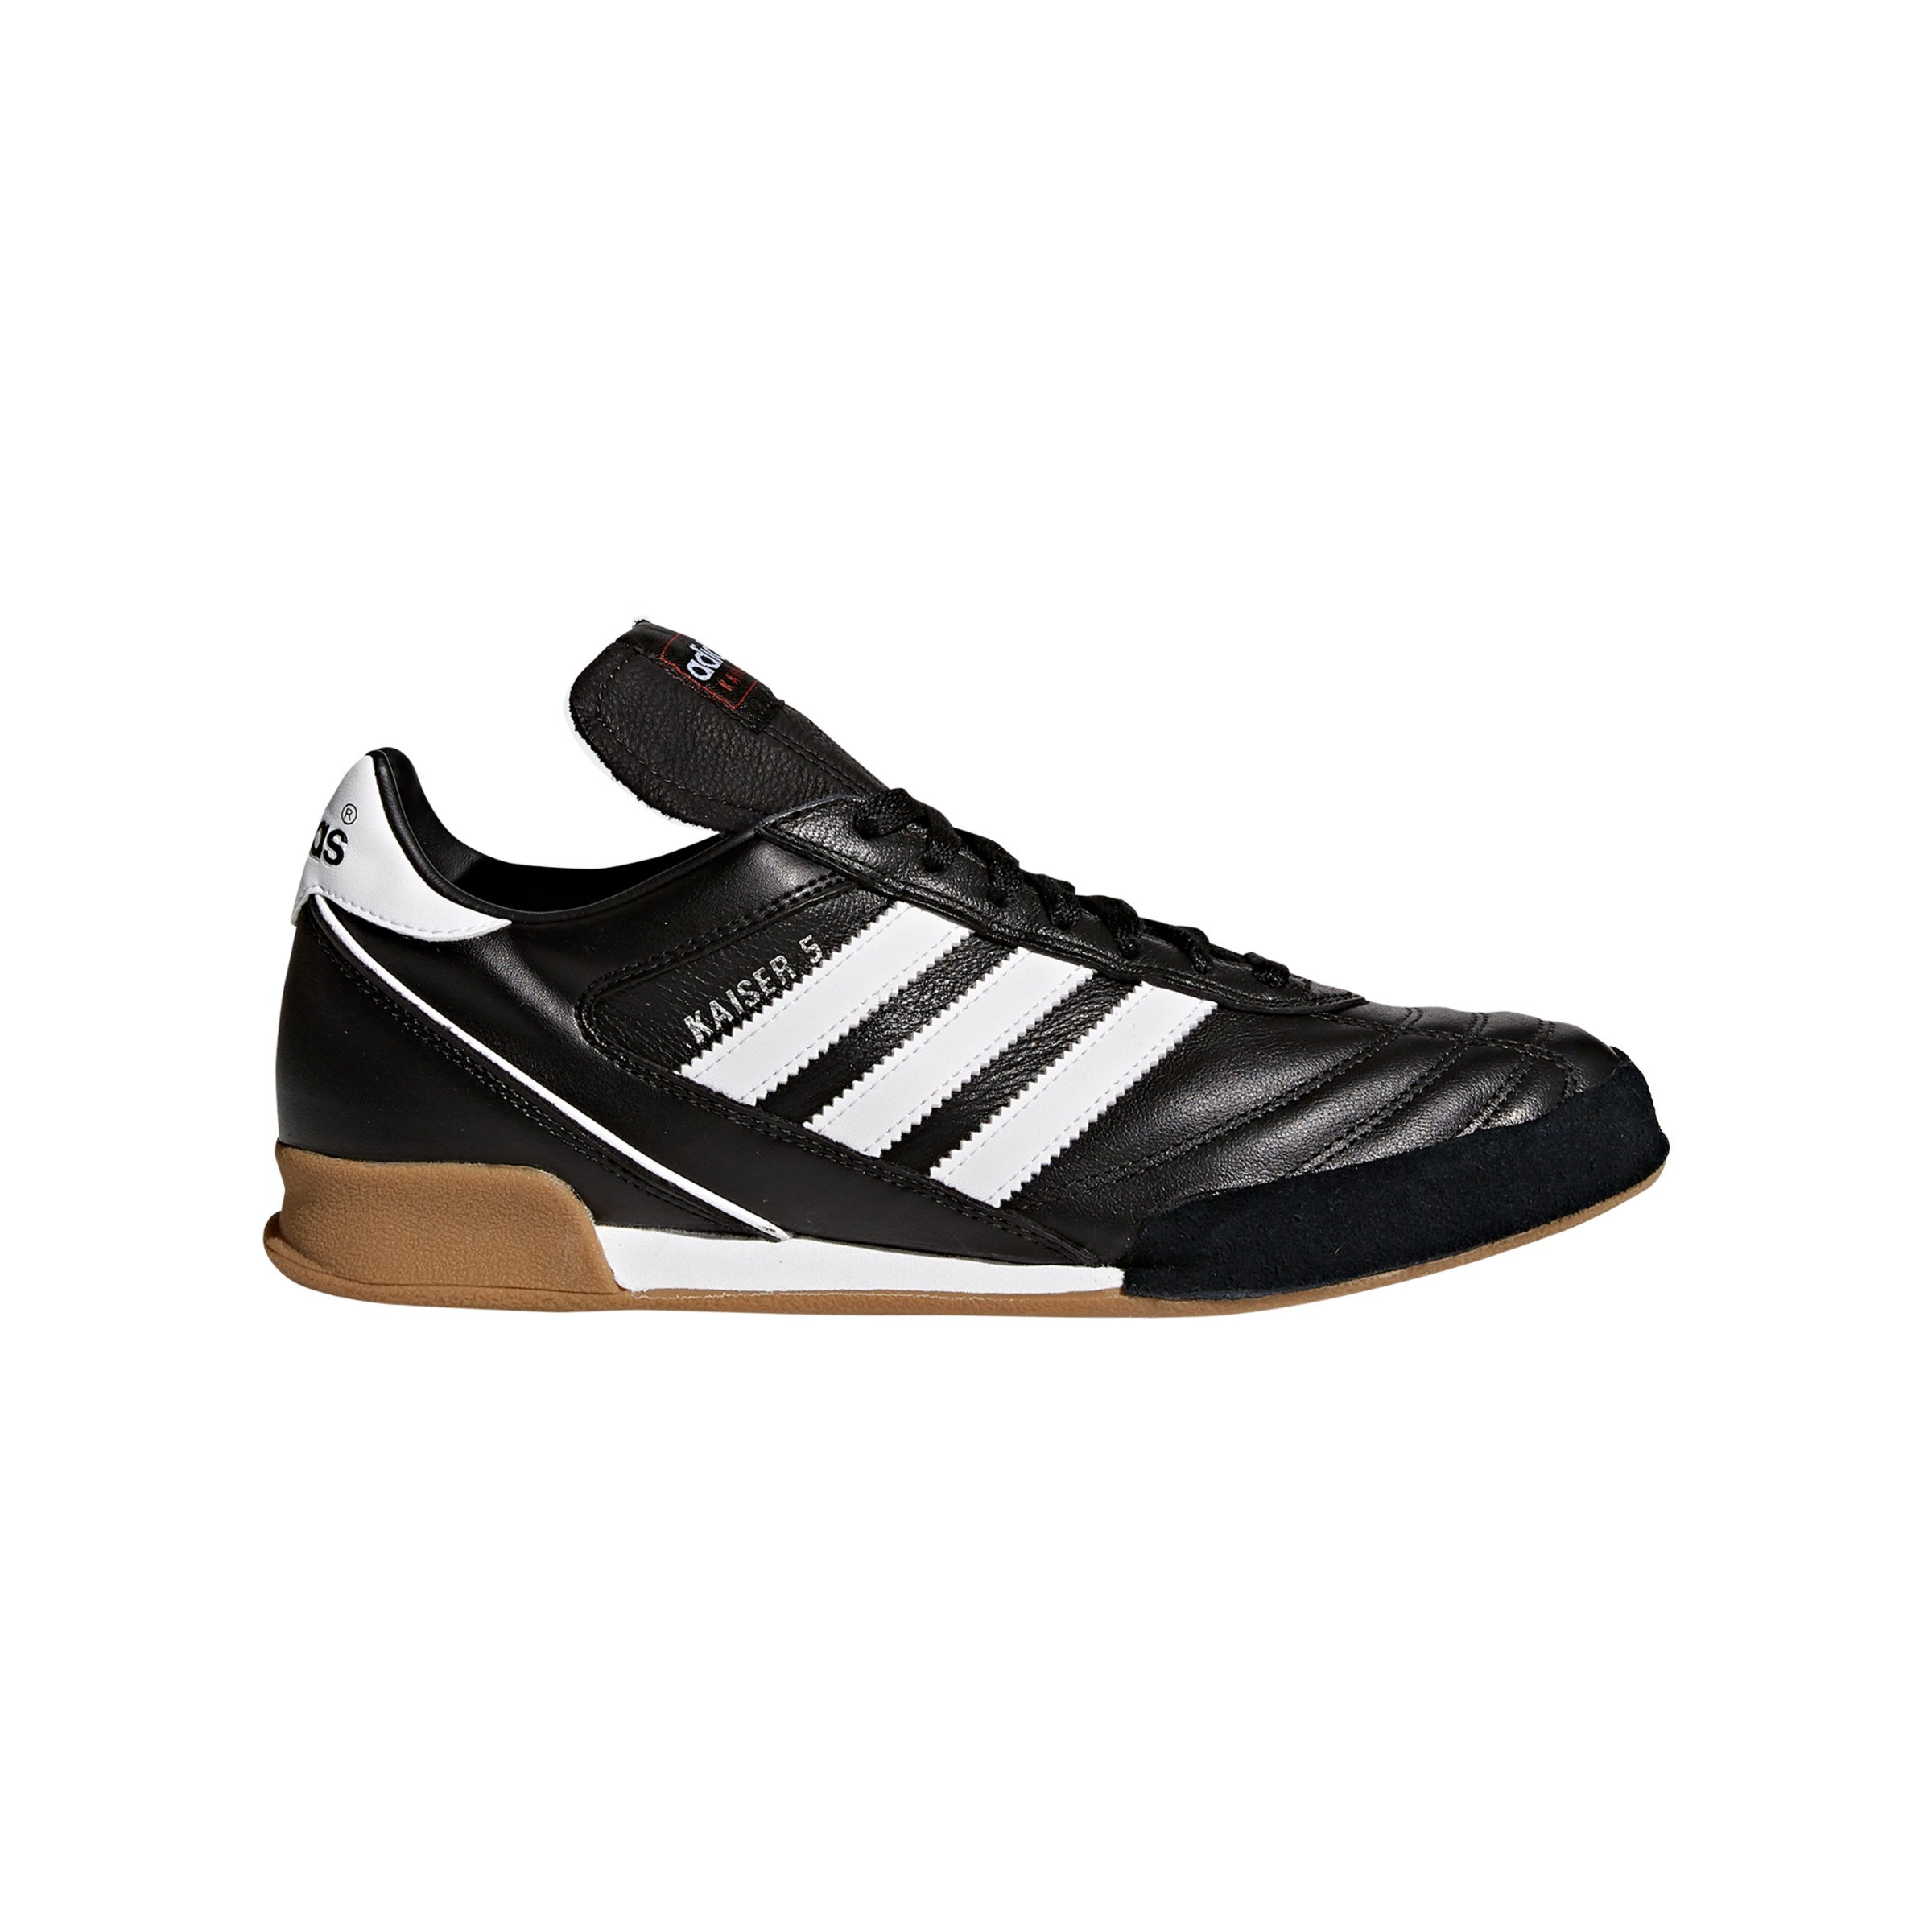 adidas Hallenschuhe Kaiser 5 Goal - schwarz